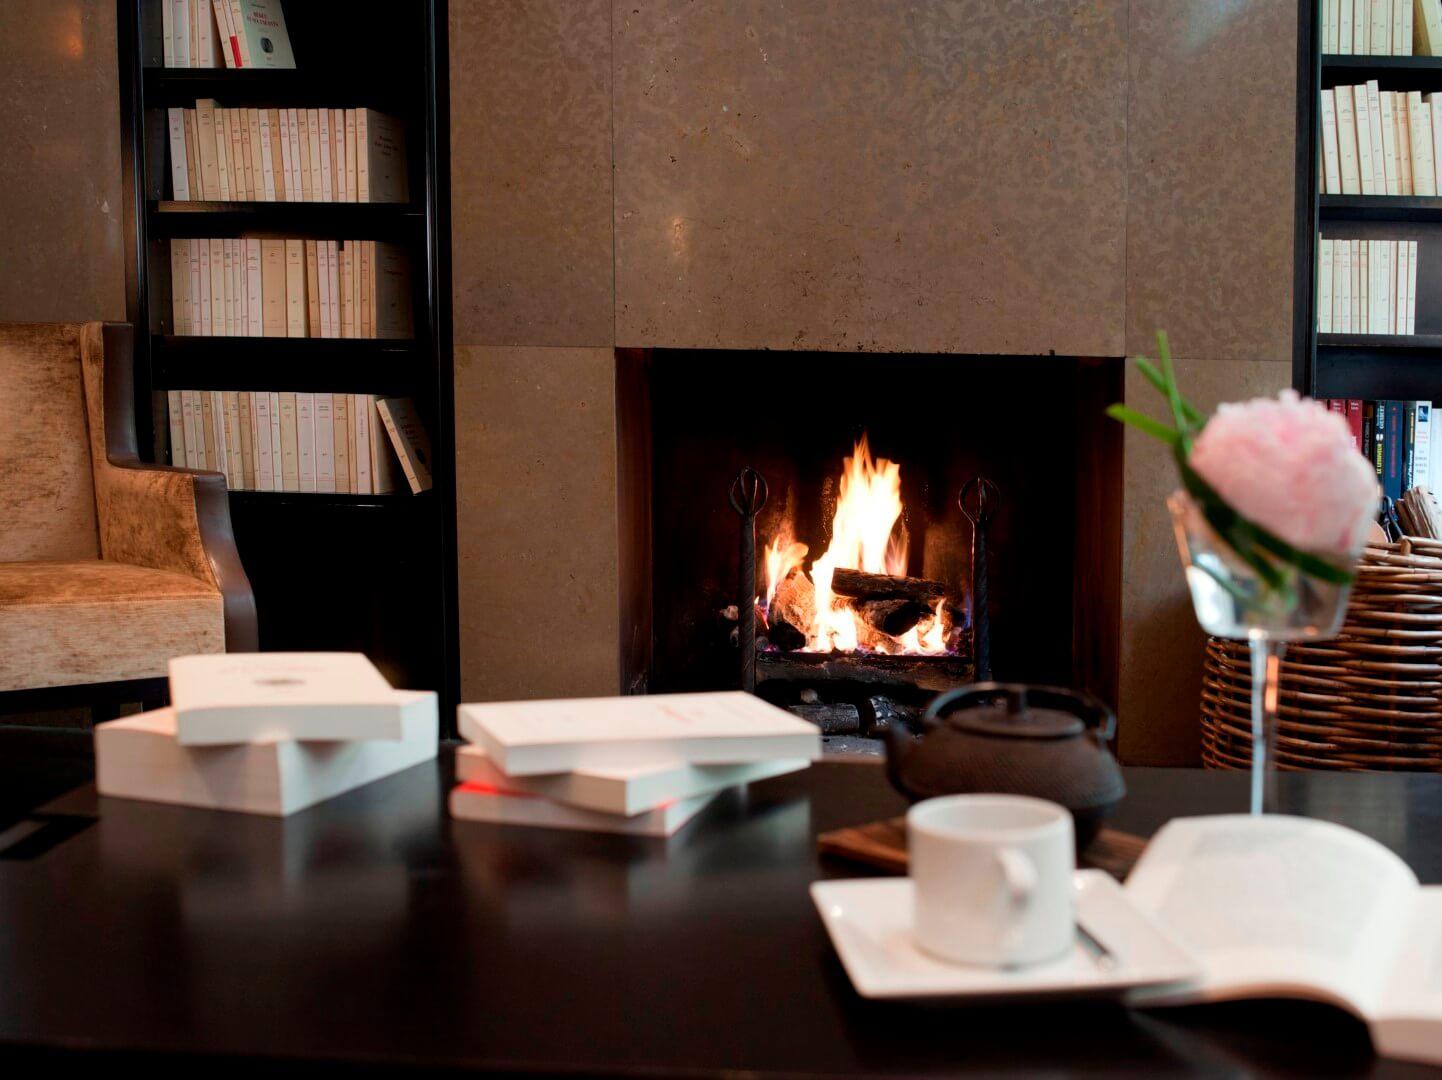 mejores hoteles con biblioteca Montalbert Paris